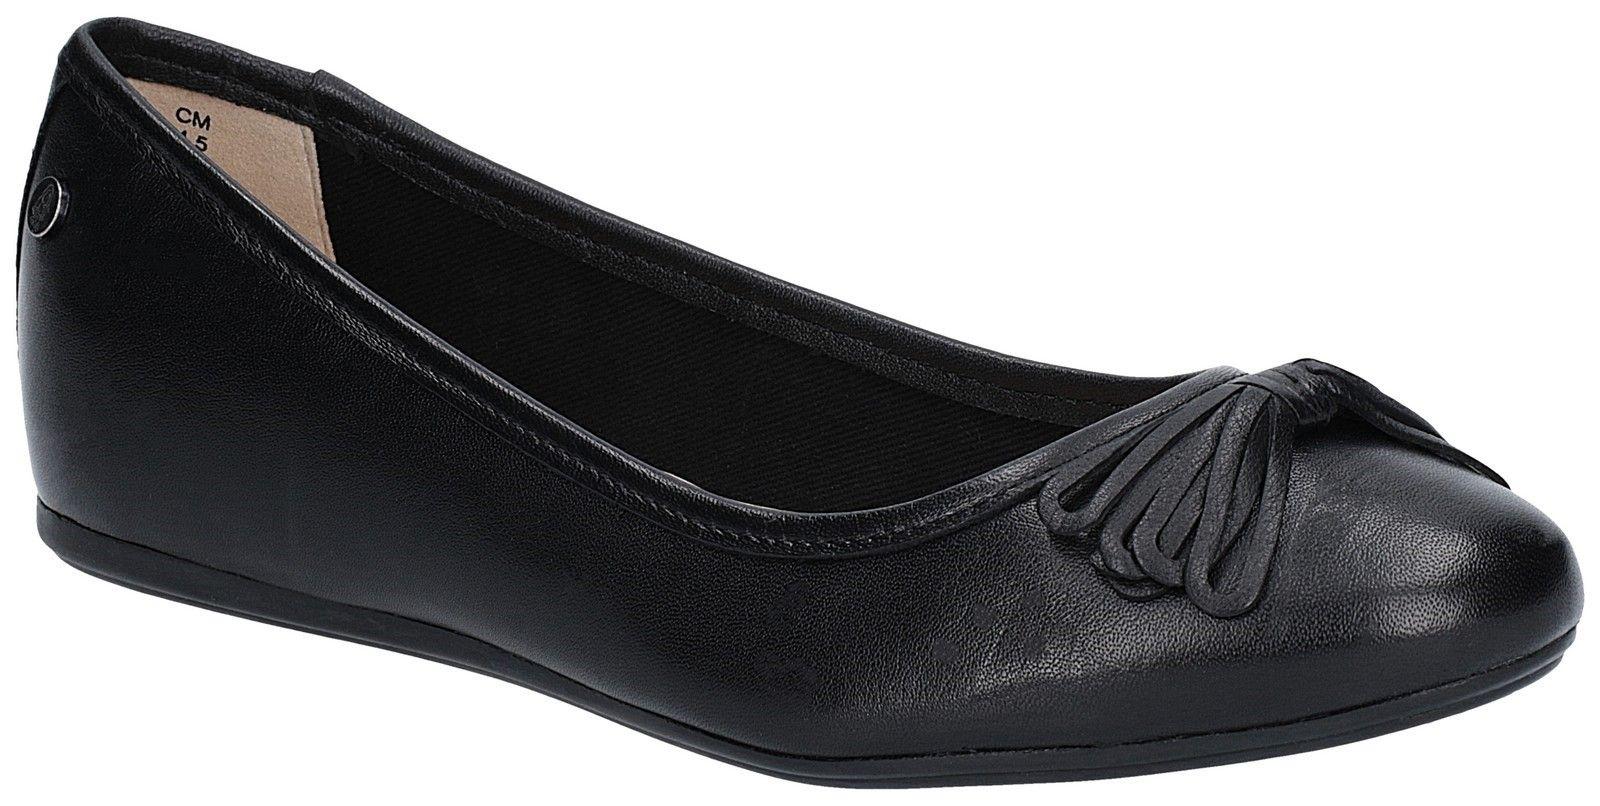 Heather Bow Ballet Shoe